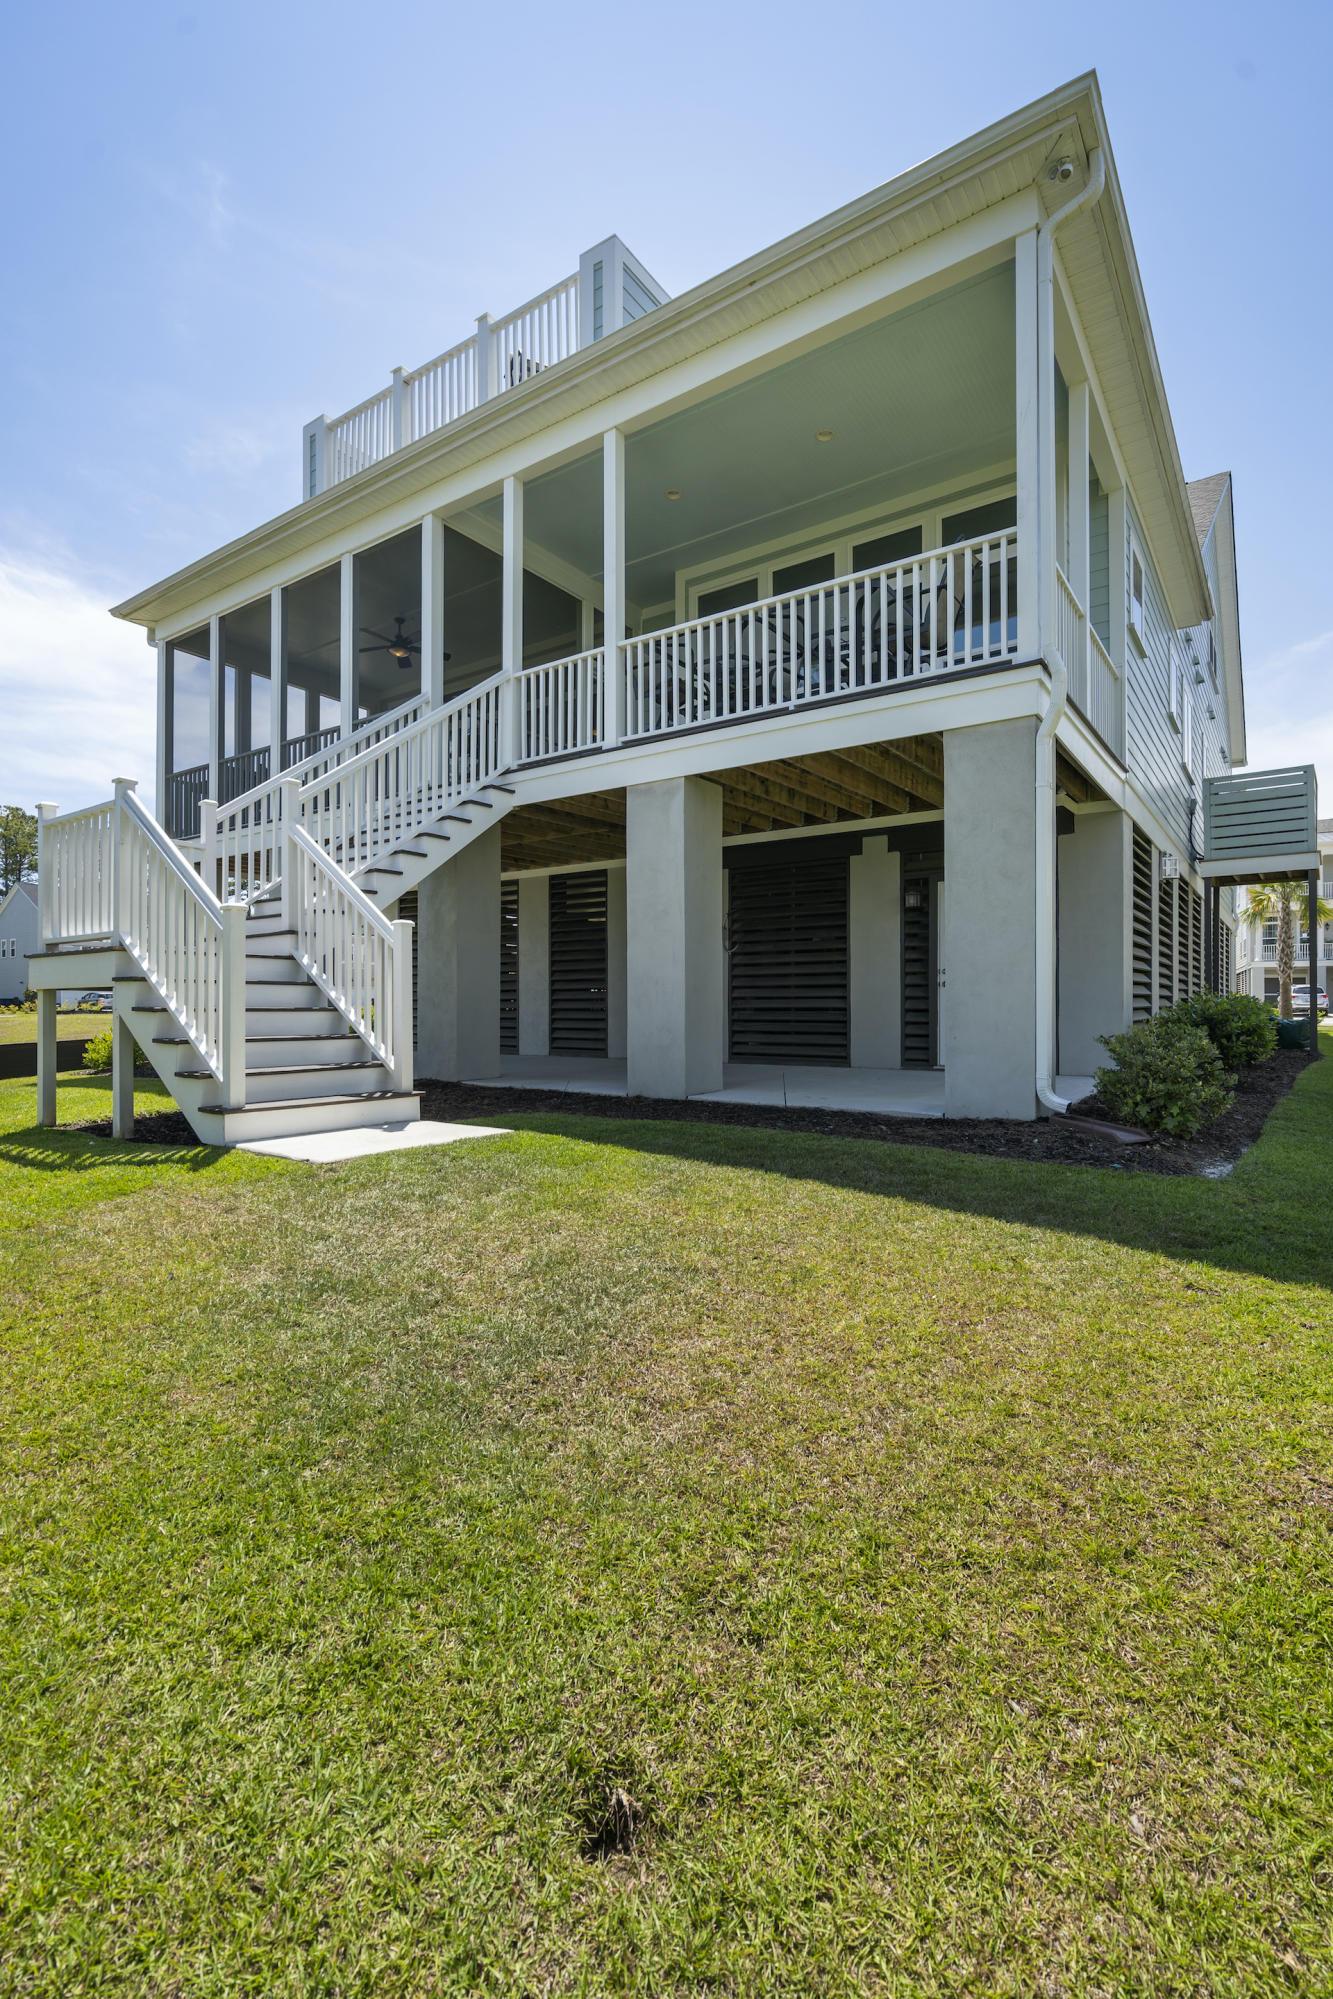 Dunes West Homes For Sale - 2316 Bucktail, Mount Pleasant, SC - 10